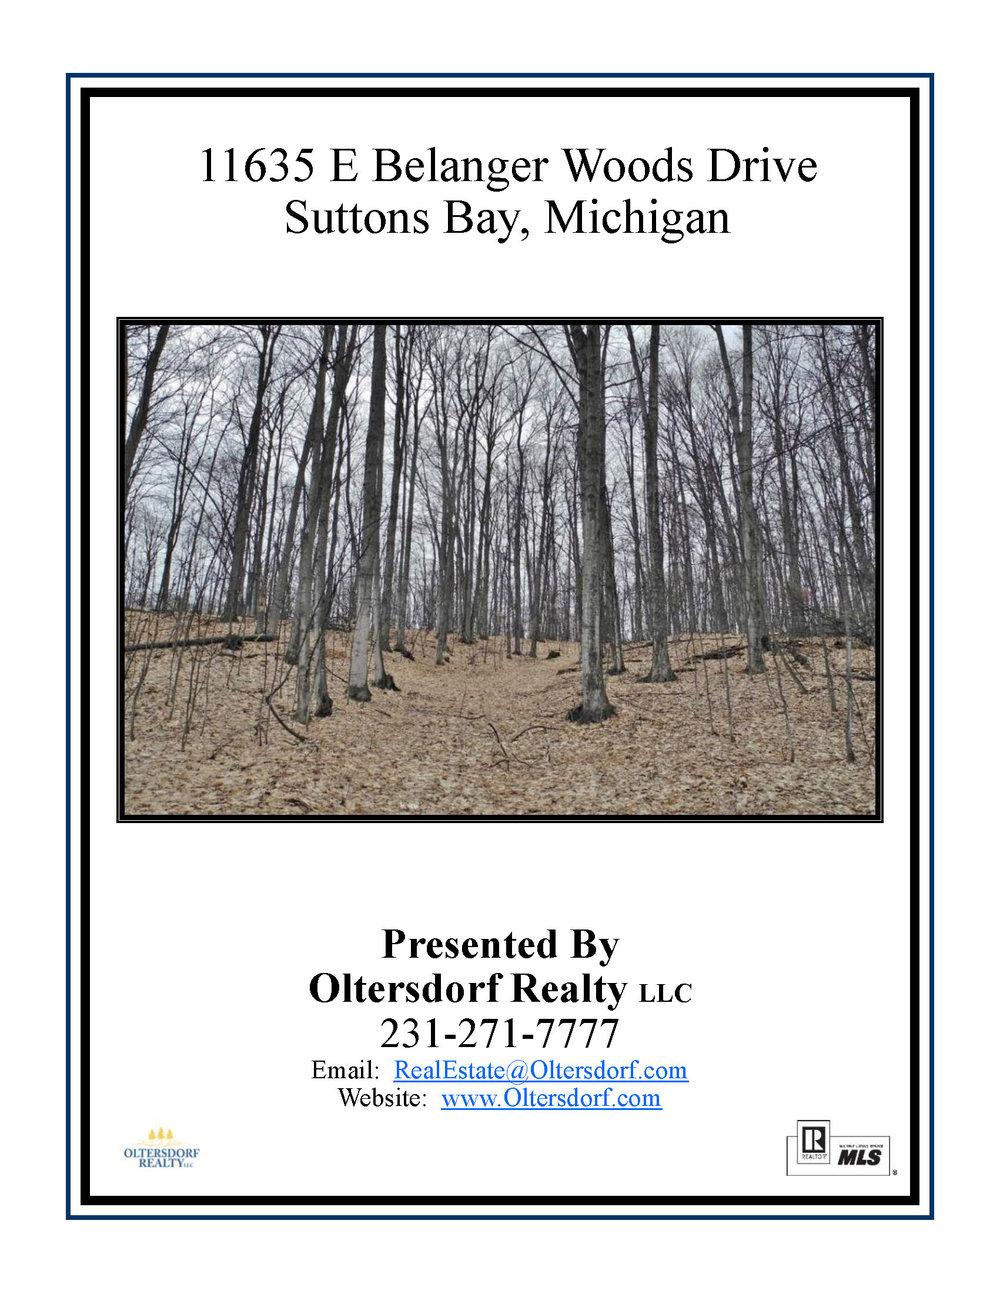 11635 E Belanger Woods Dr Marketing Packet - For Sale by Oltersdorf Realty LLC (1).jpg